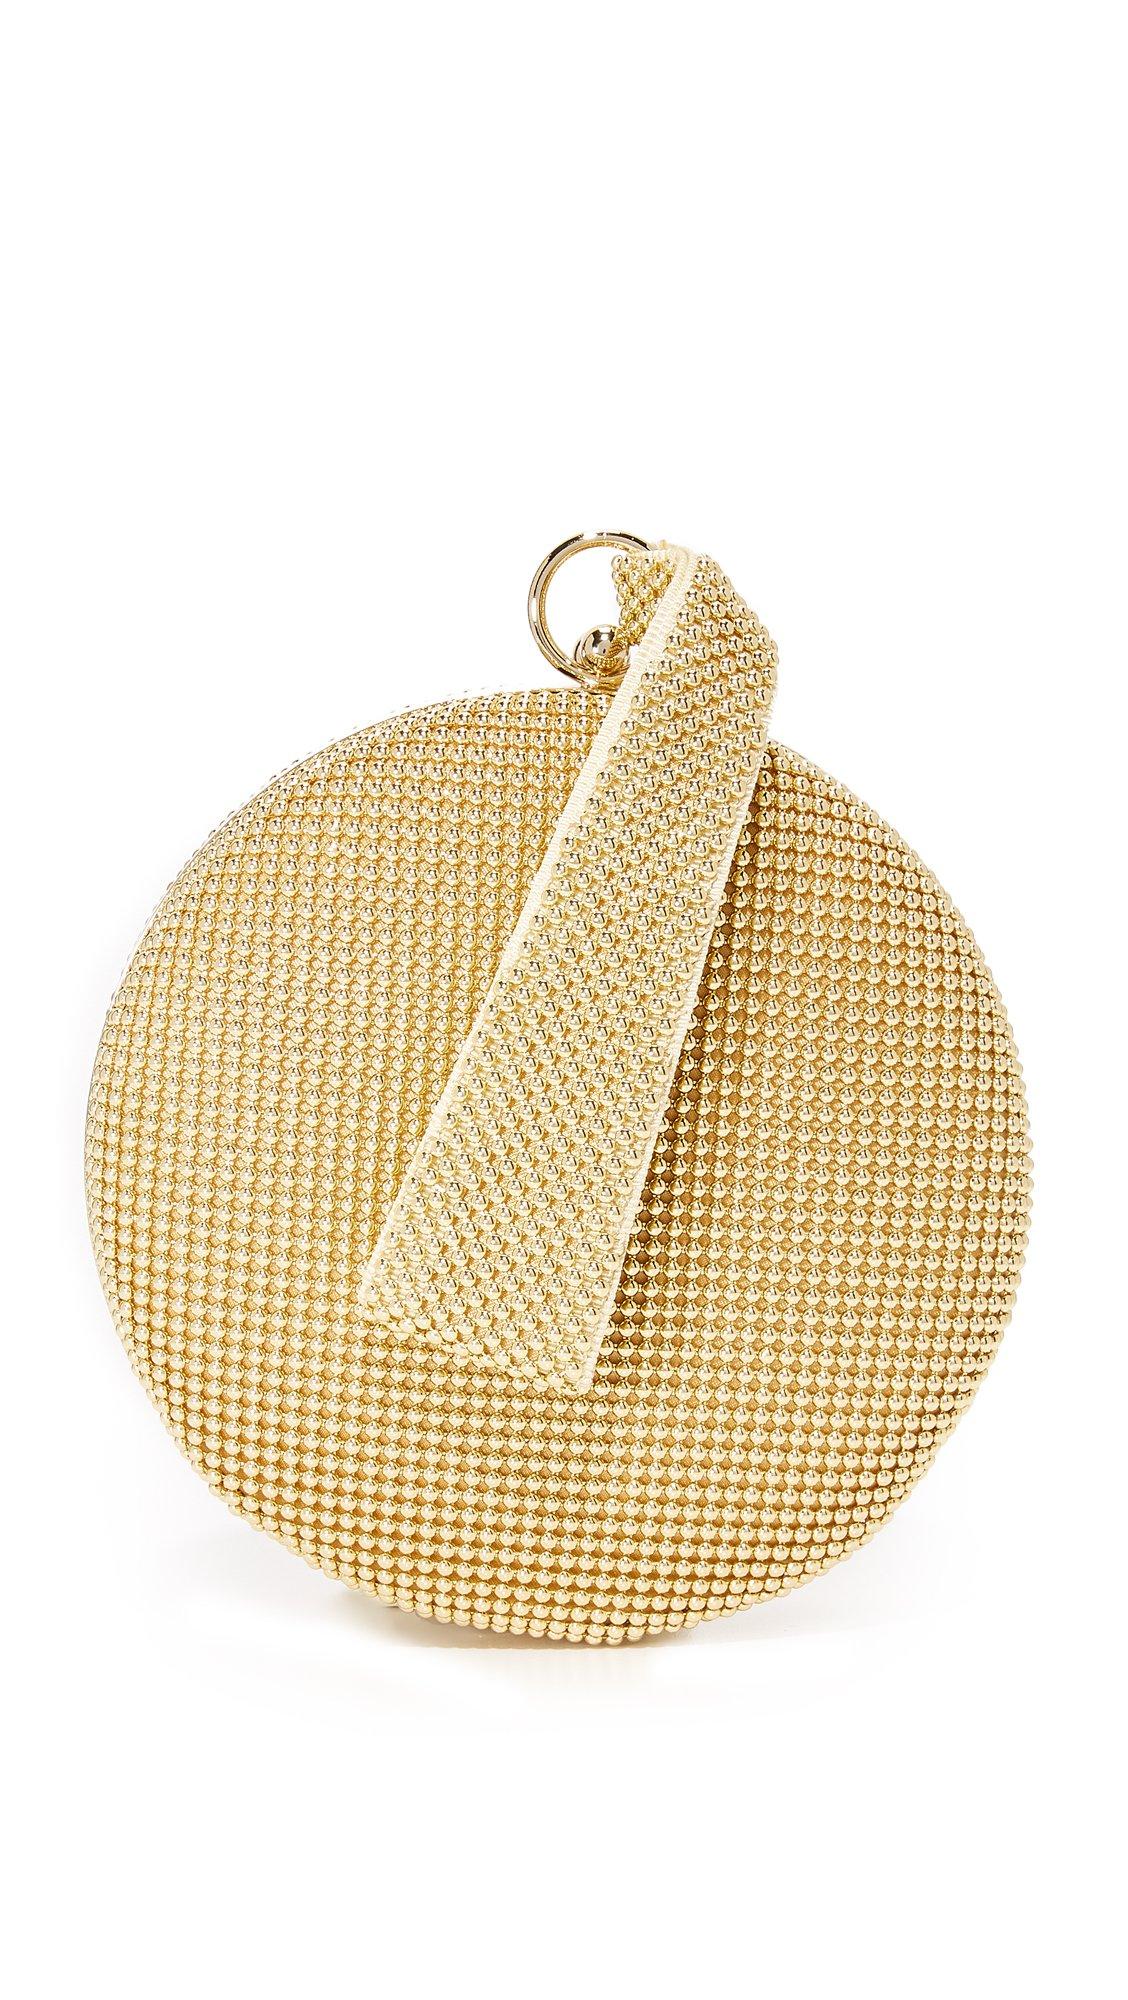 Whiting & Davis Women's Canteen Wristlet, Gold, One Size